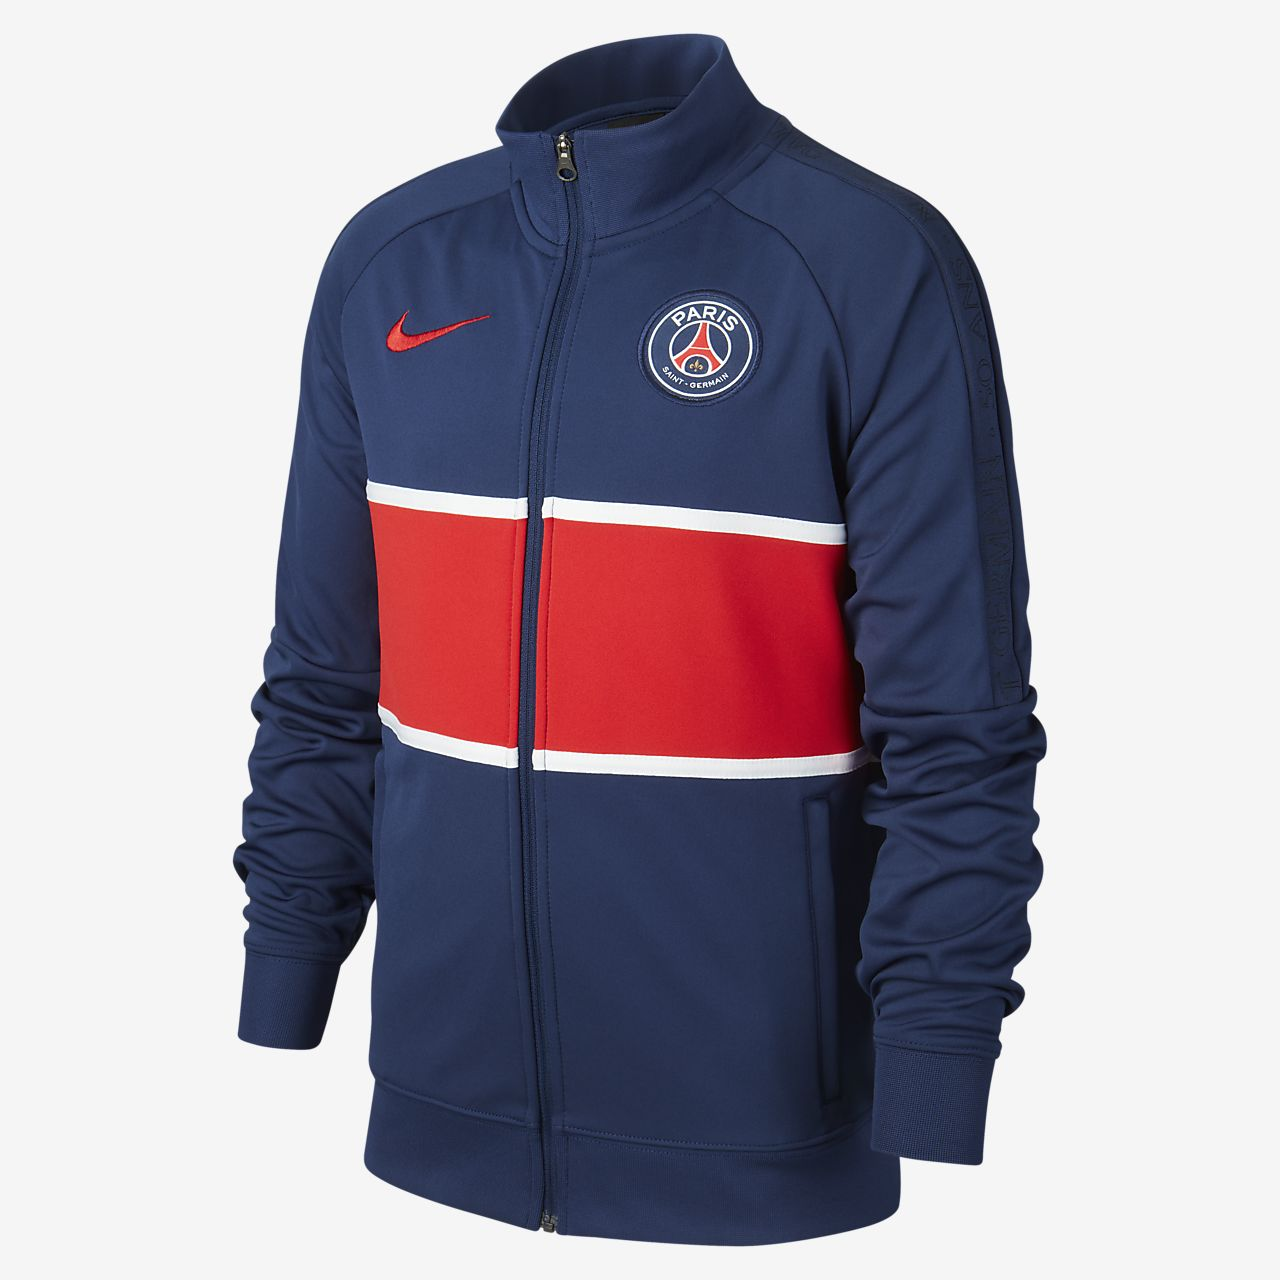 Paris Saint-Germain Older Kids' Football Tracksuit Jacket